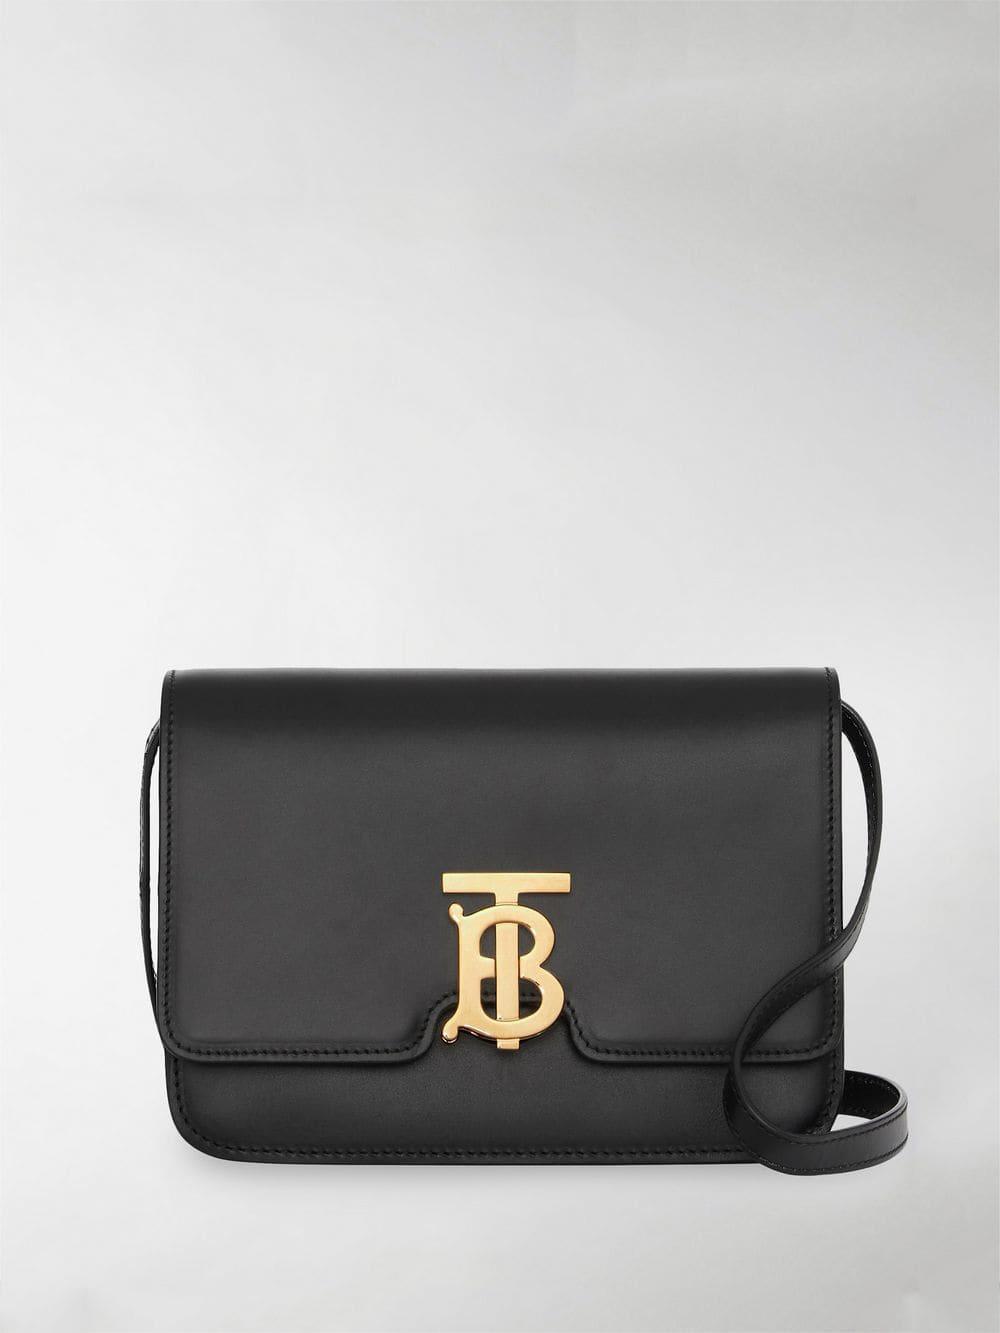 f6d7dd9f7b21 Lyst - Burberry Small Tb Monogram Bag in Black - Save 20%